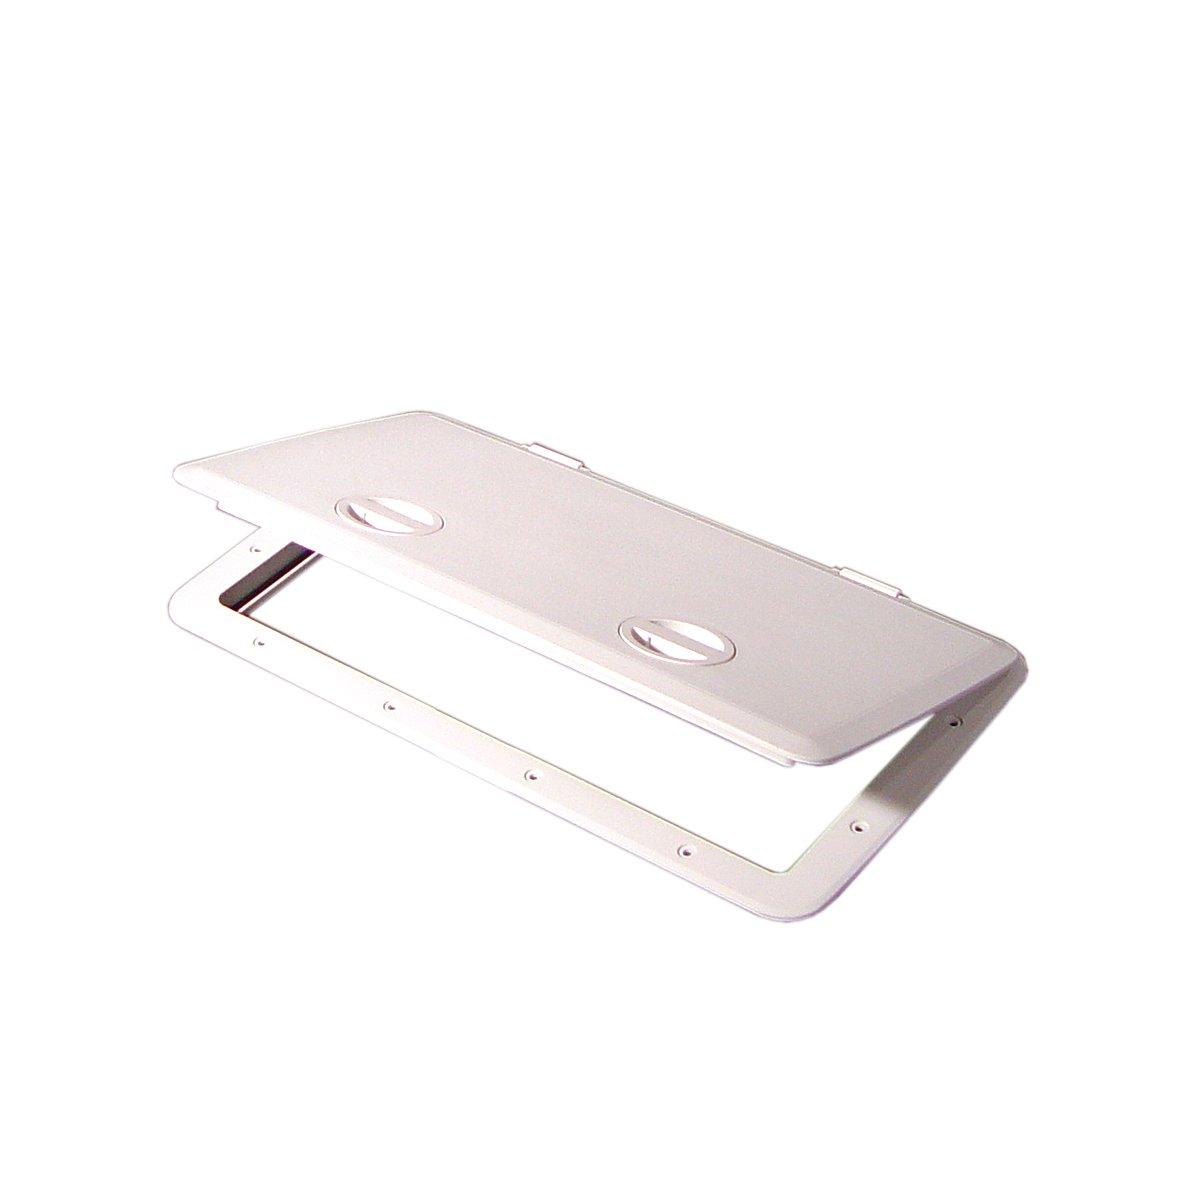 Tempress Products Inc 44530 1323 Cam Hatch W/O Lock White by Tempress